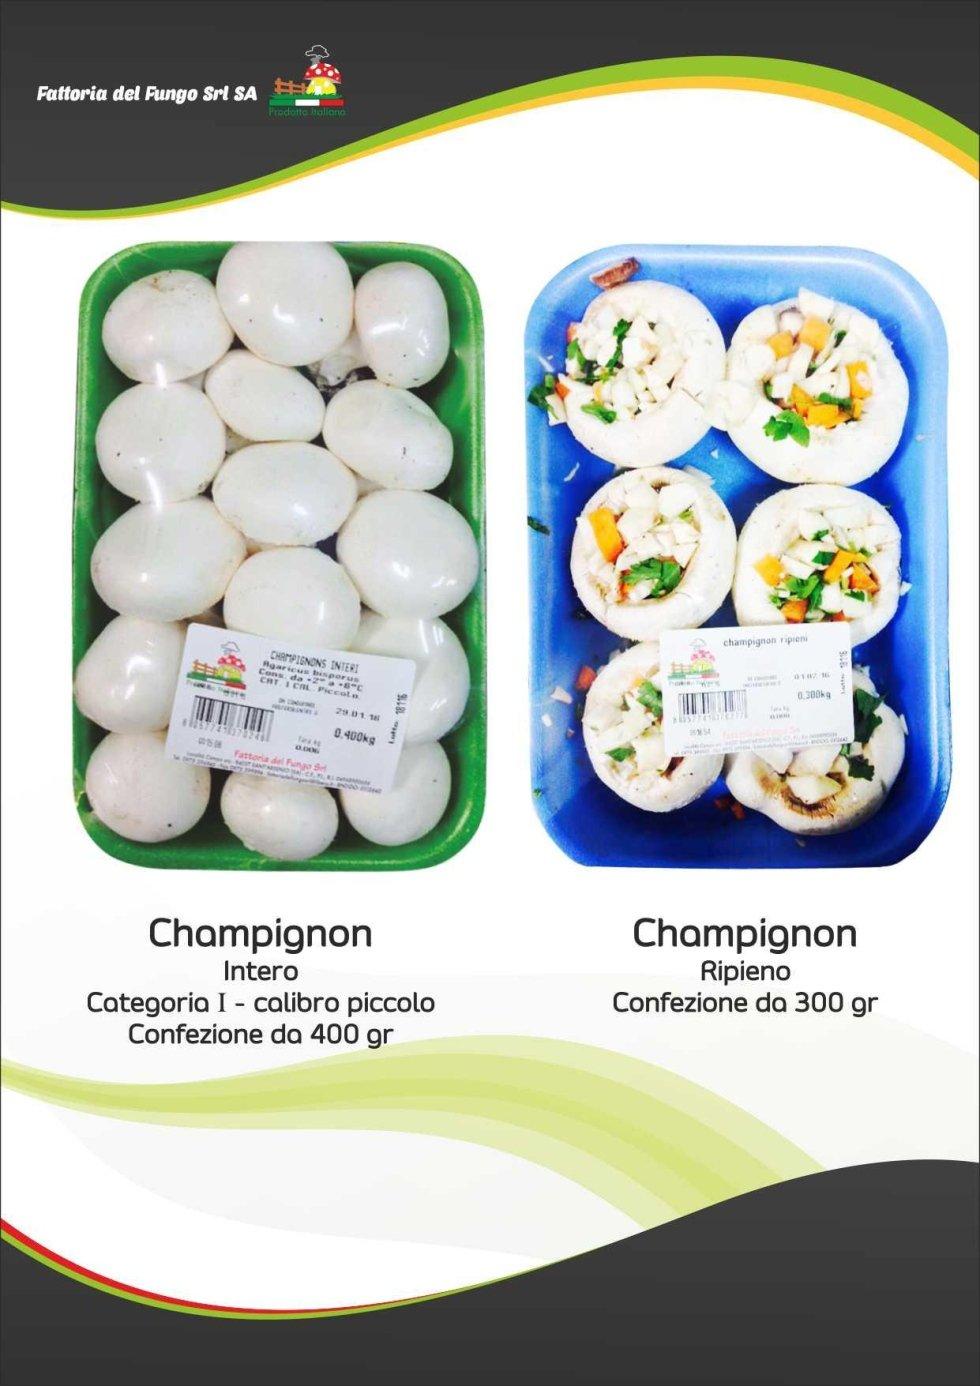 Funghi freschi in vaschetta